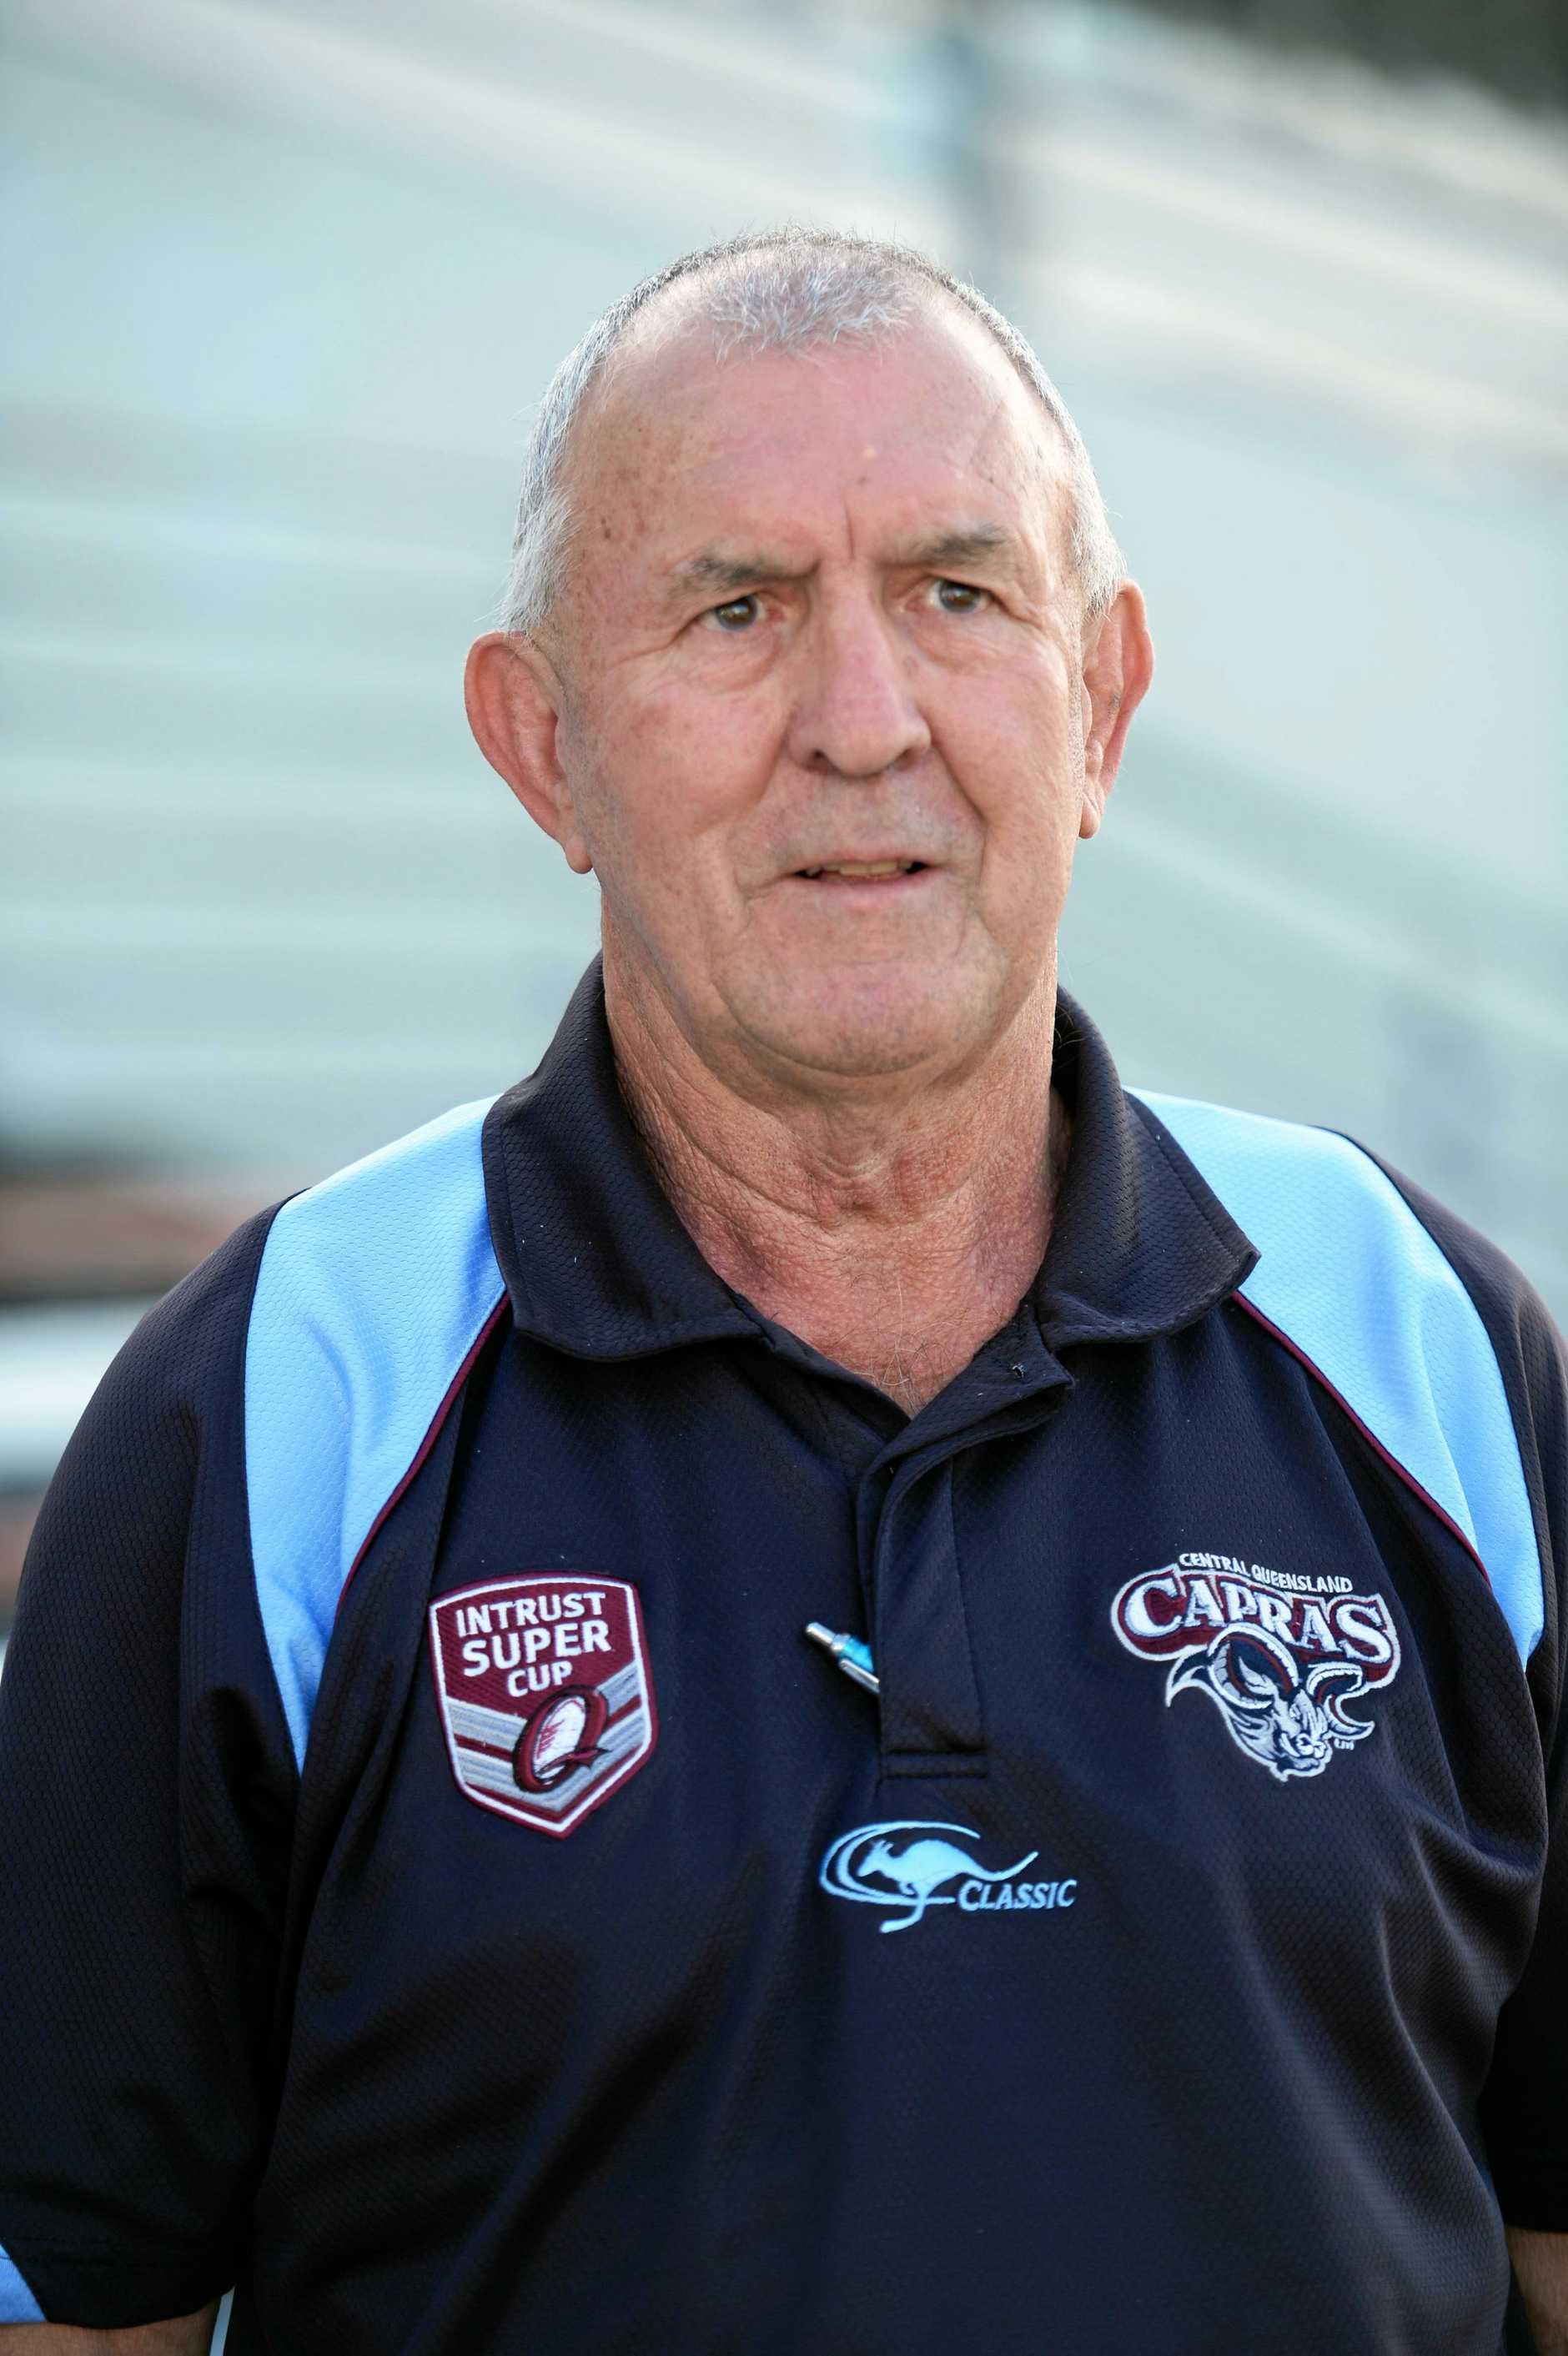 Capras board member Greg Reynolds.